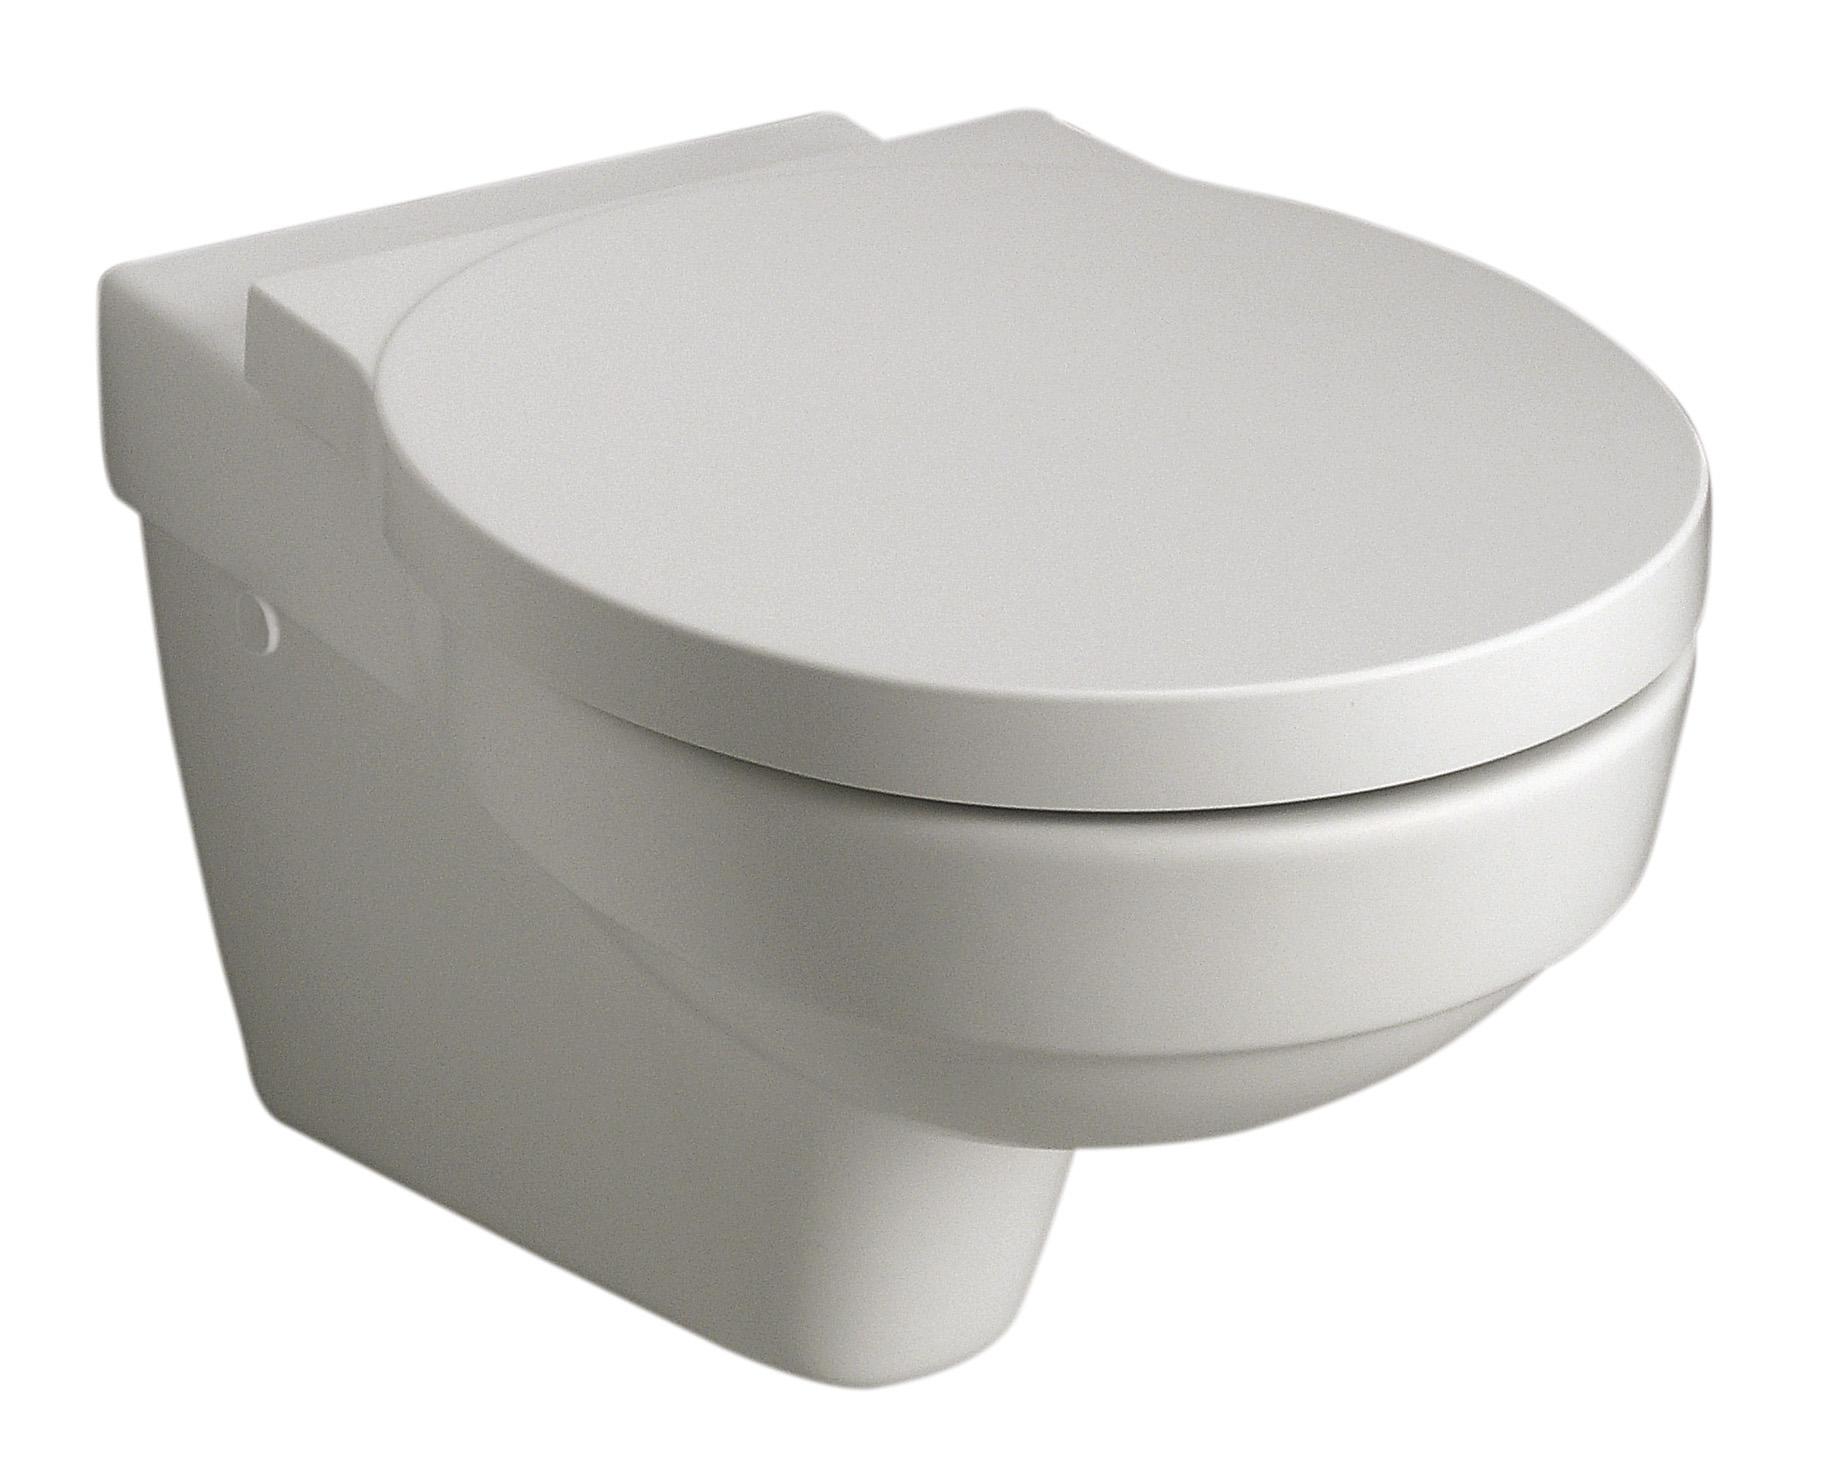 wc/klozety Kolo VARIUS K33100 900 WC závěsné Reflex